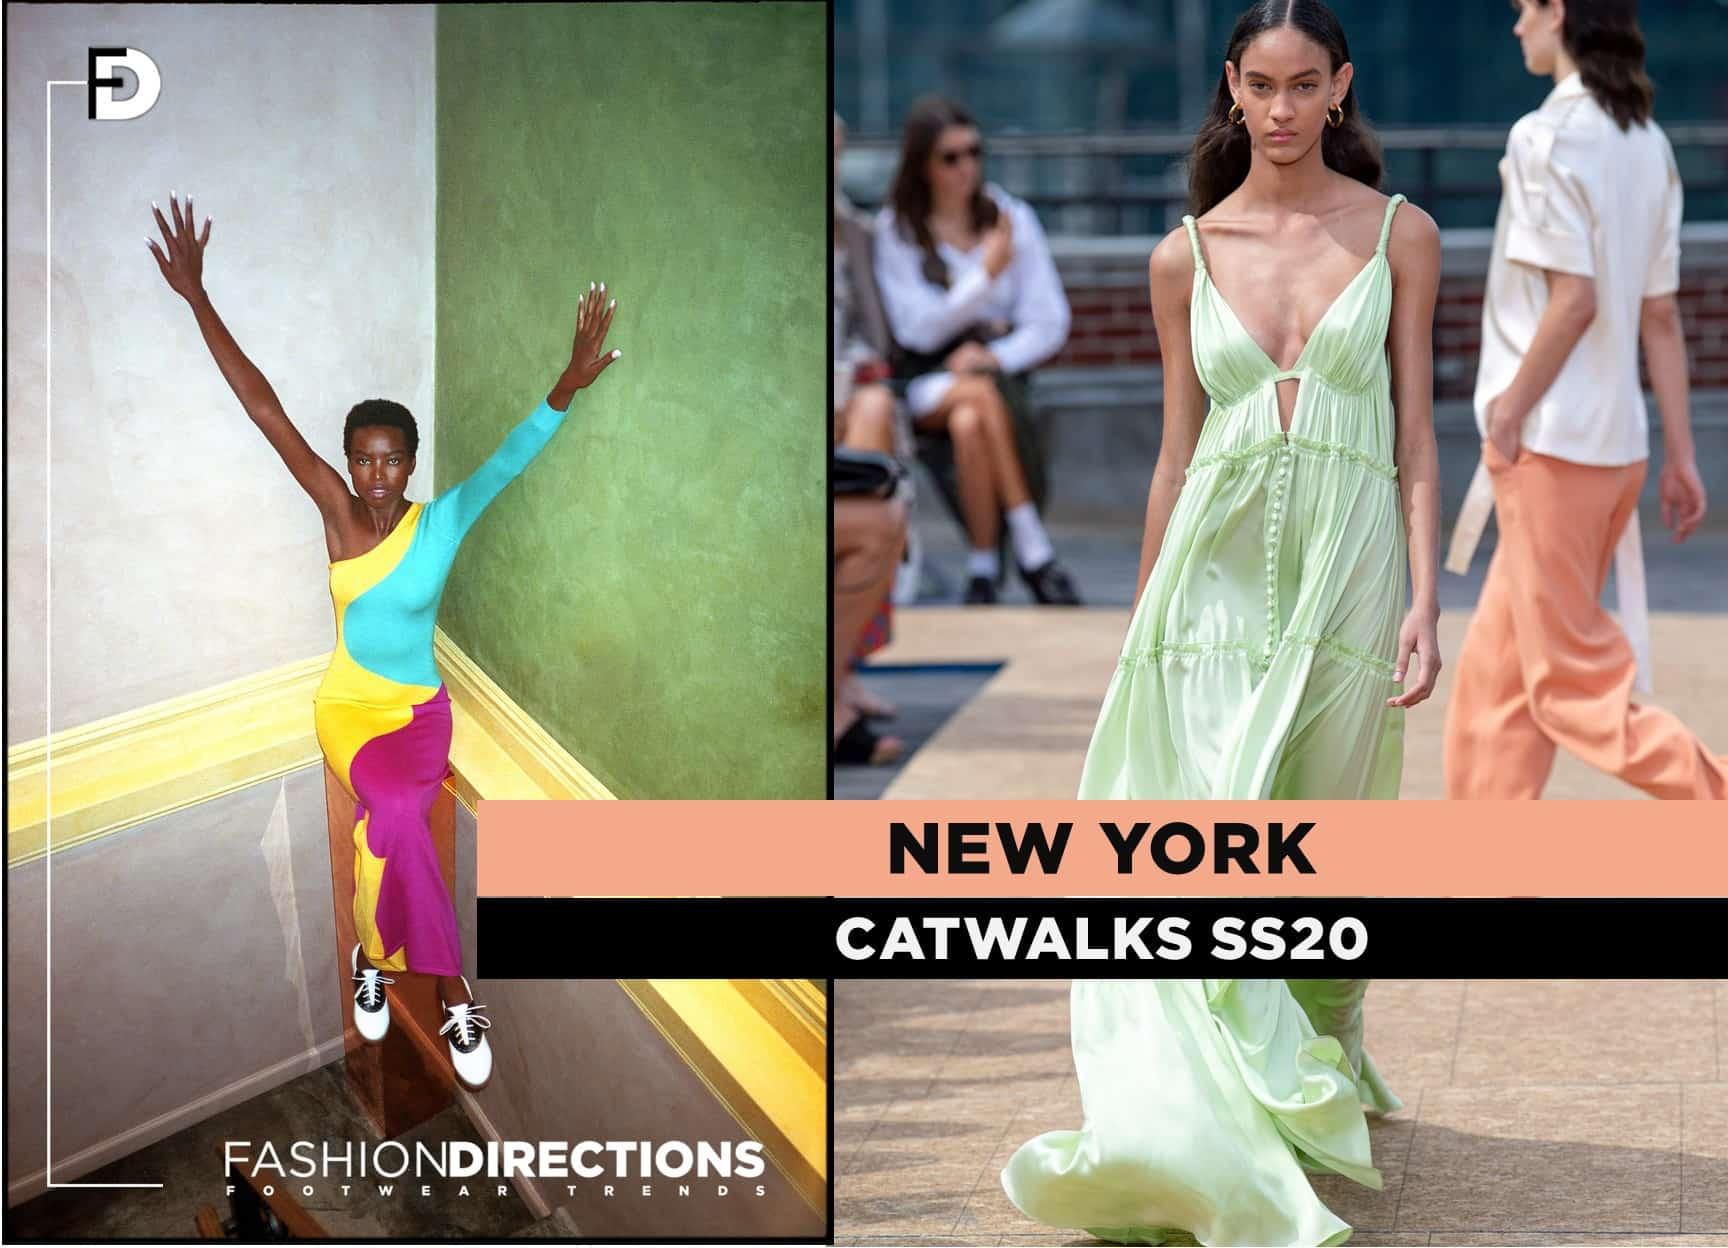 NEW YORK CATWALKS SS20